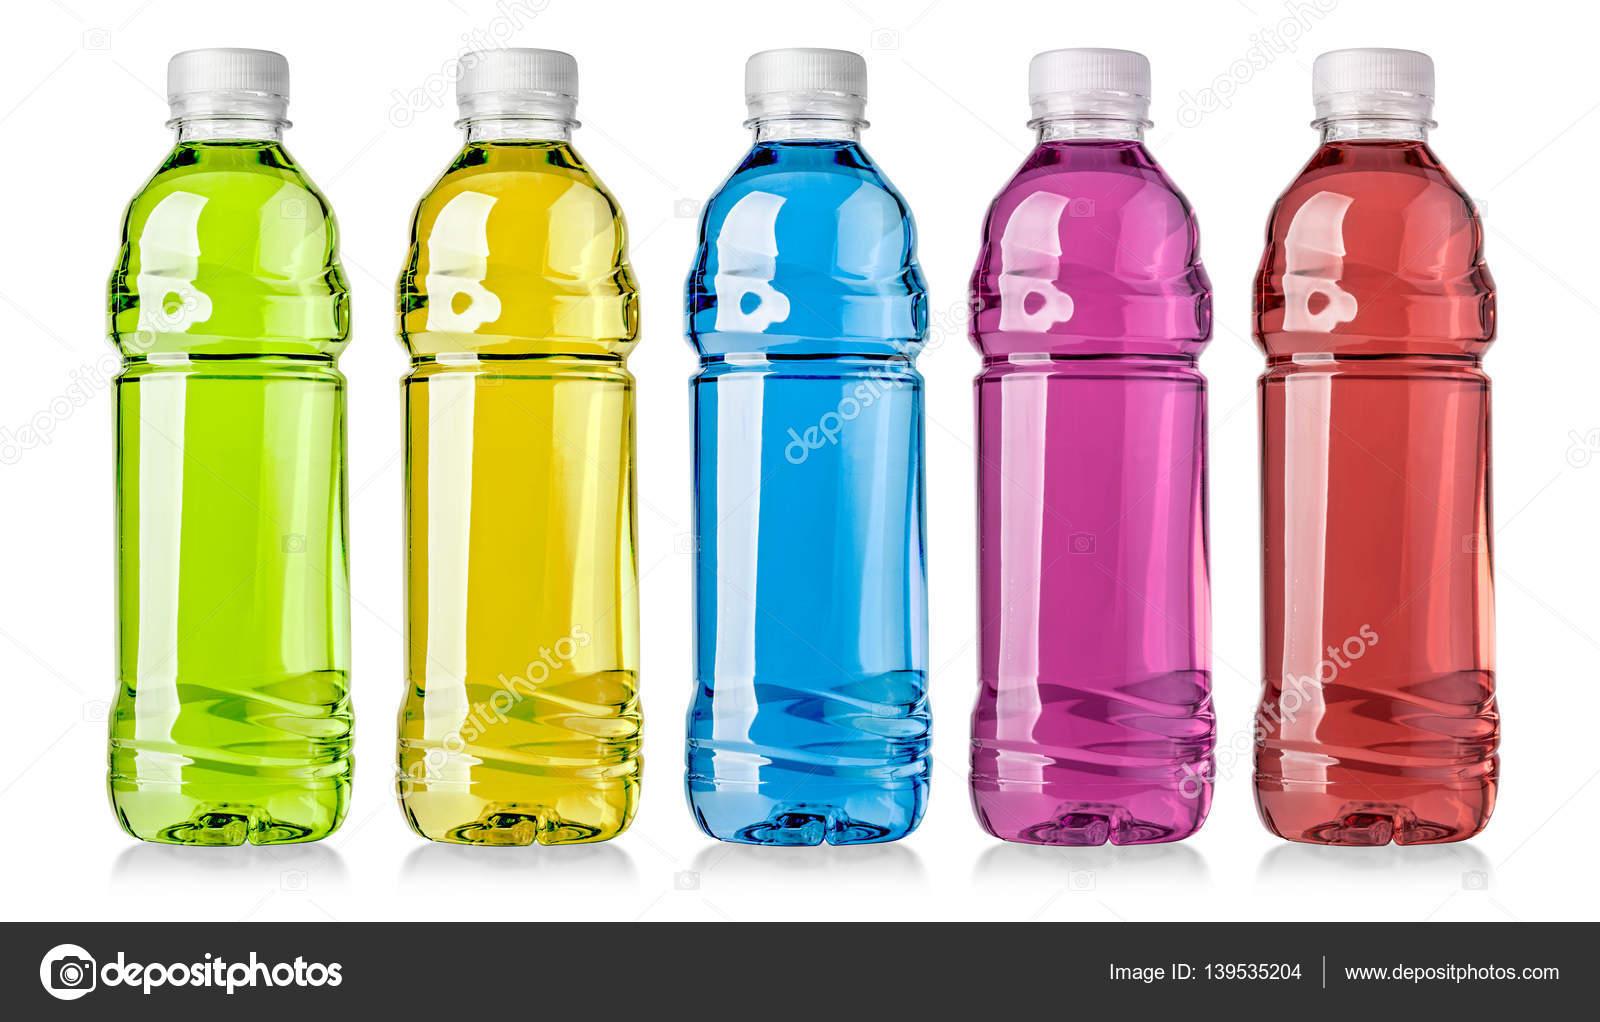 Fitness Getränk Flasche — Stockfoto © kornienkoalex #139535204